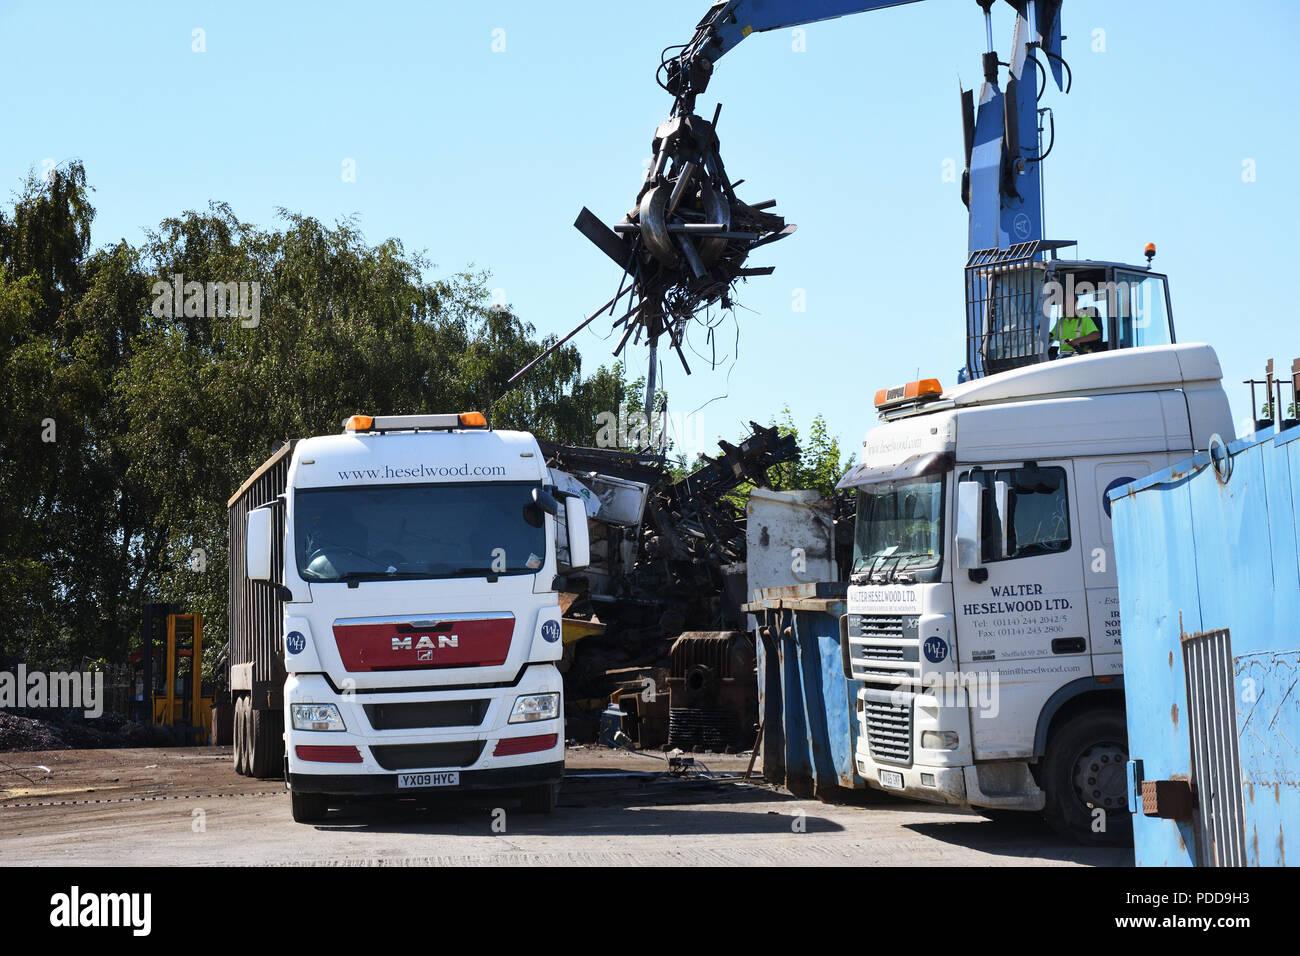 MAN bulk tipper being loaded with scrap metal in a Sheffield scrap yard - Stock Image